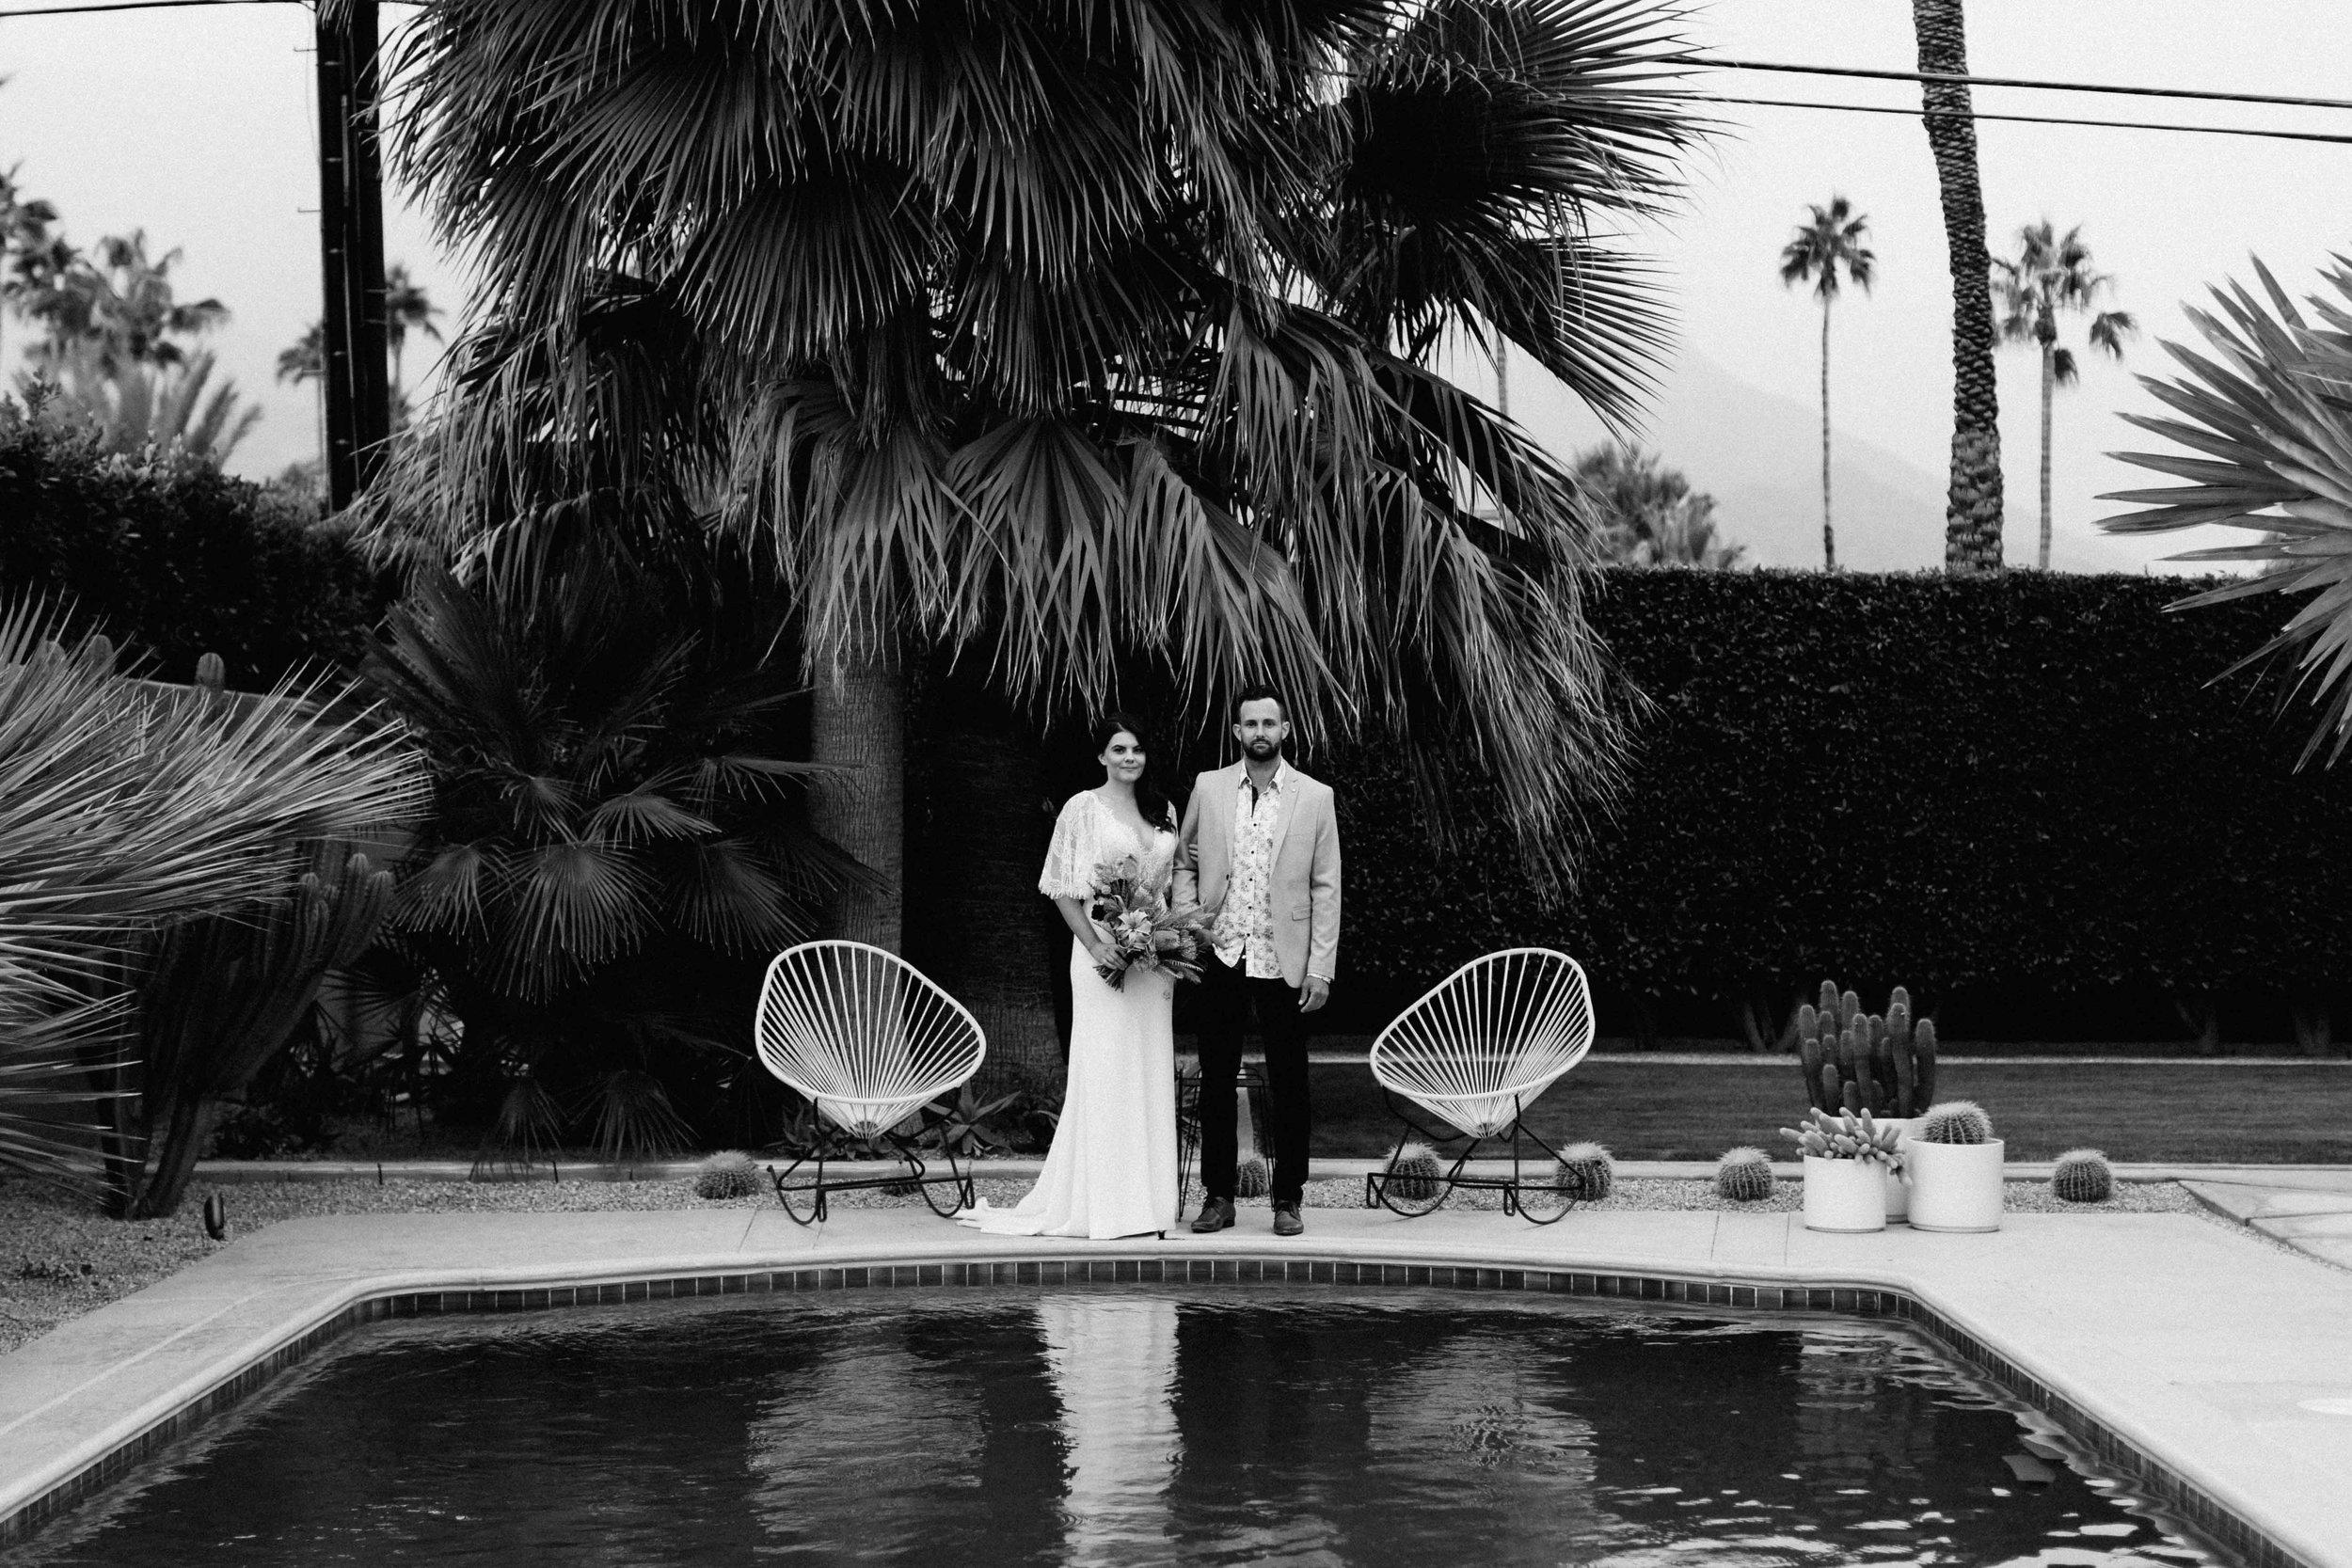 America Joshua Tree Palm Springs Elopement wedding-19.jpg